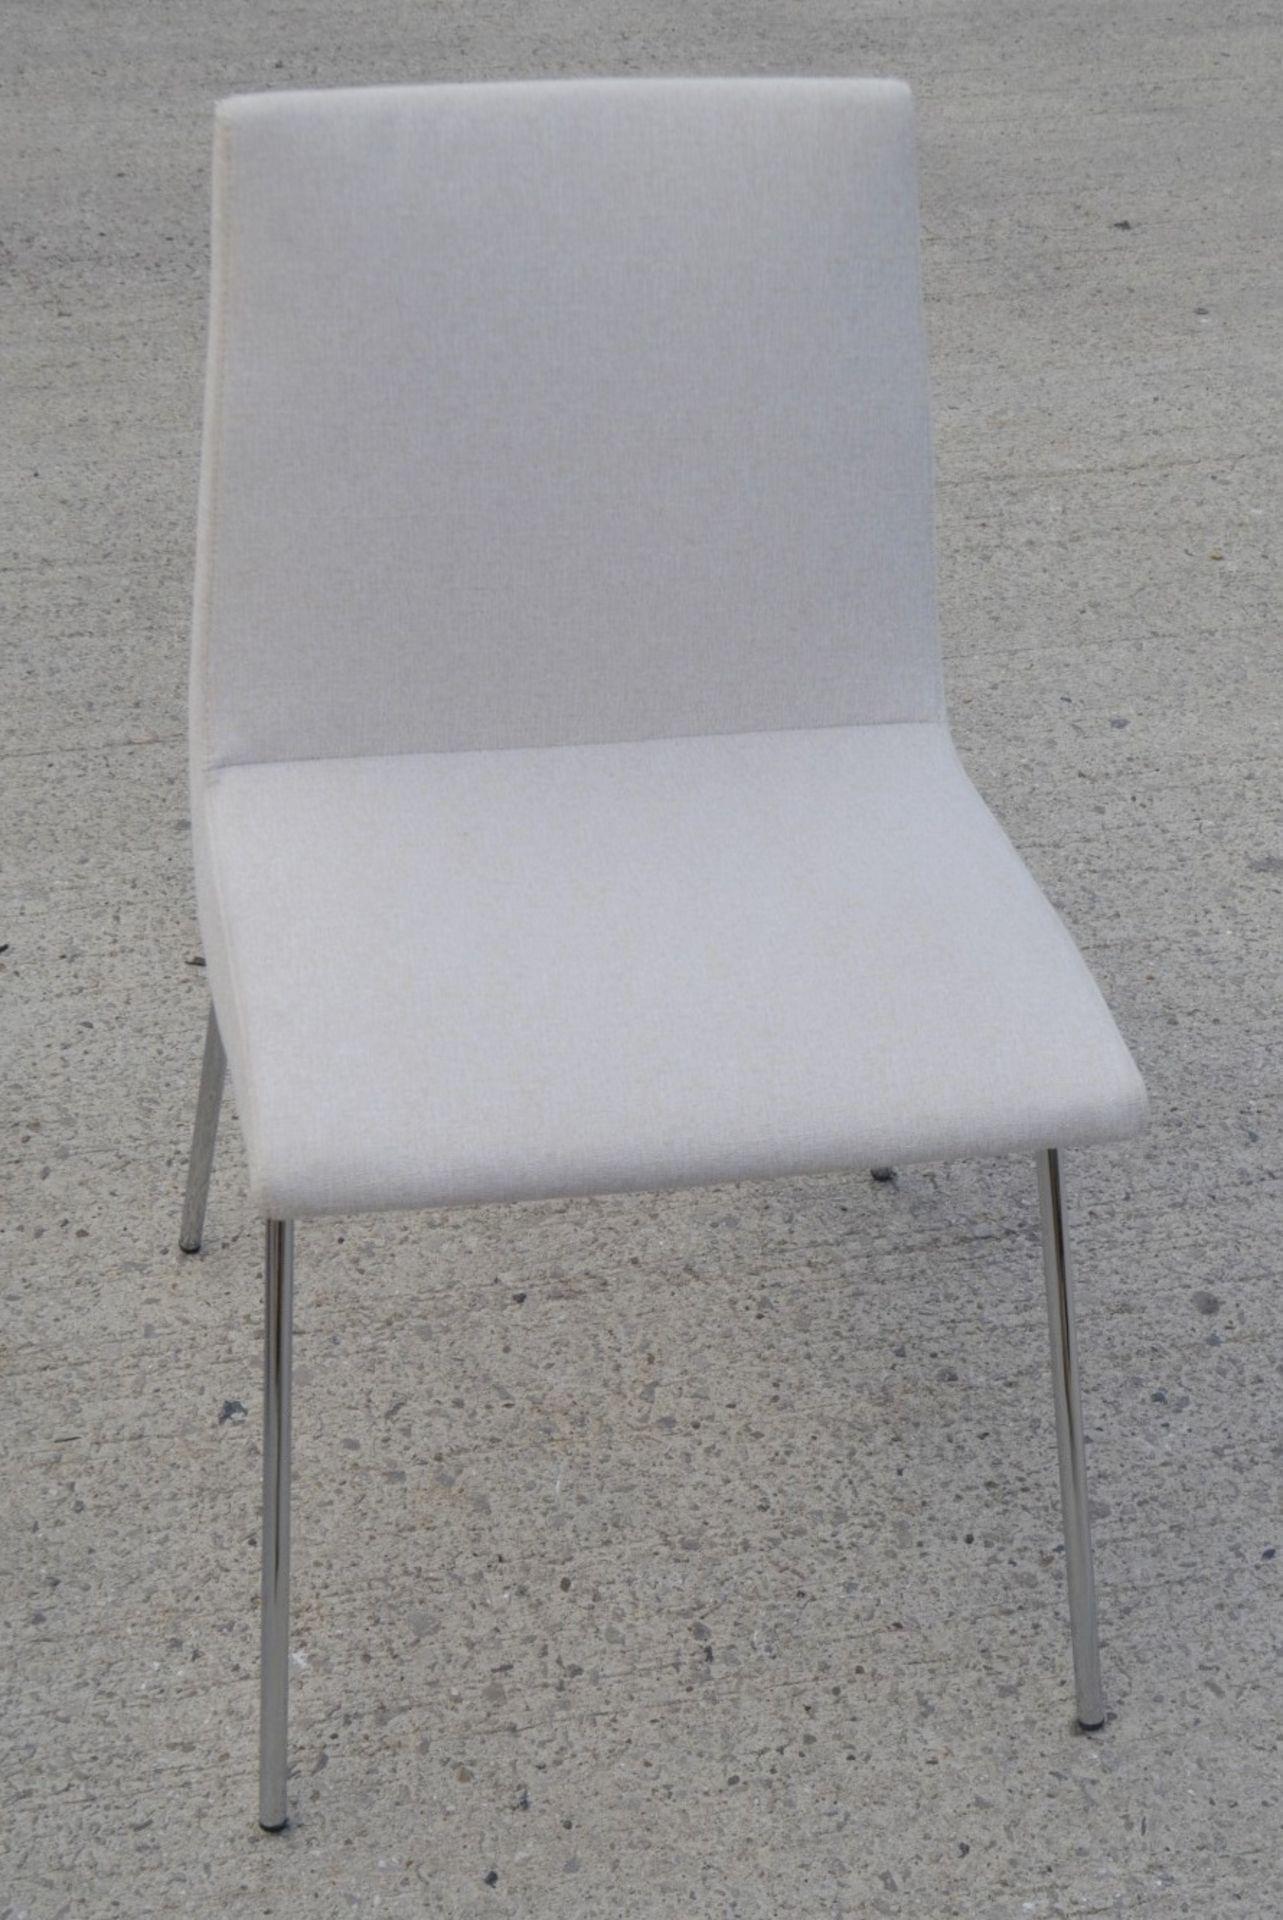 Pair Of LIGNE ROSET 'TV' Designer Dining Chairs In A Light Neutral Beige Fabric & Chromed Steel Legs - Image 9 of 9